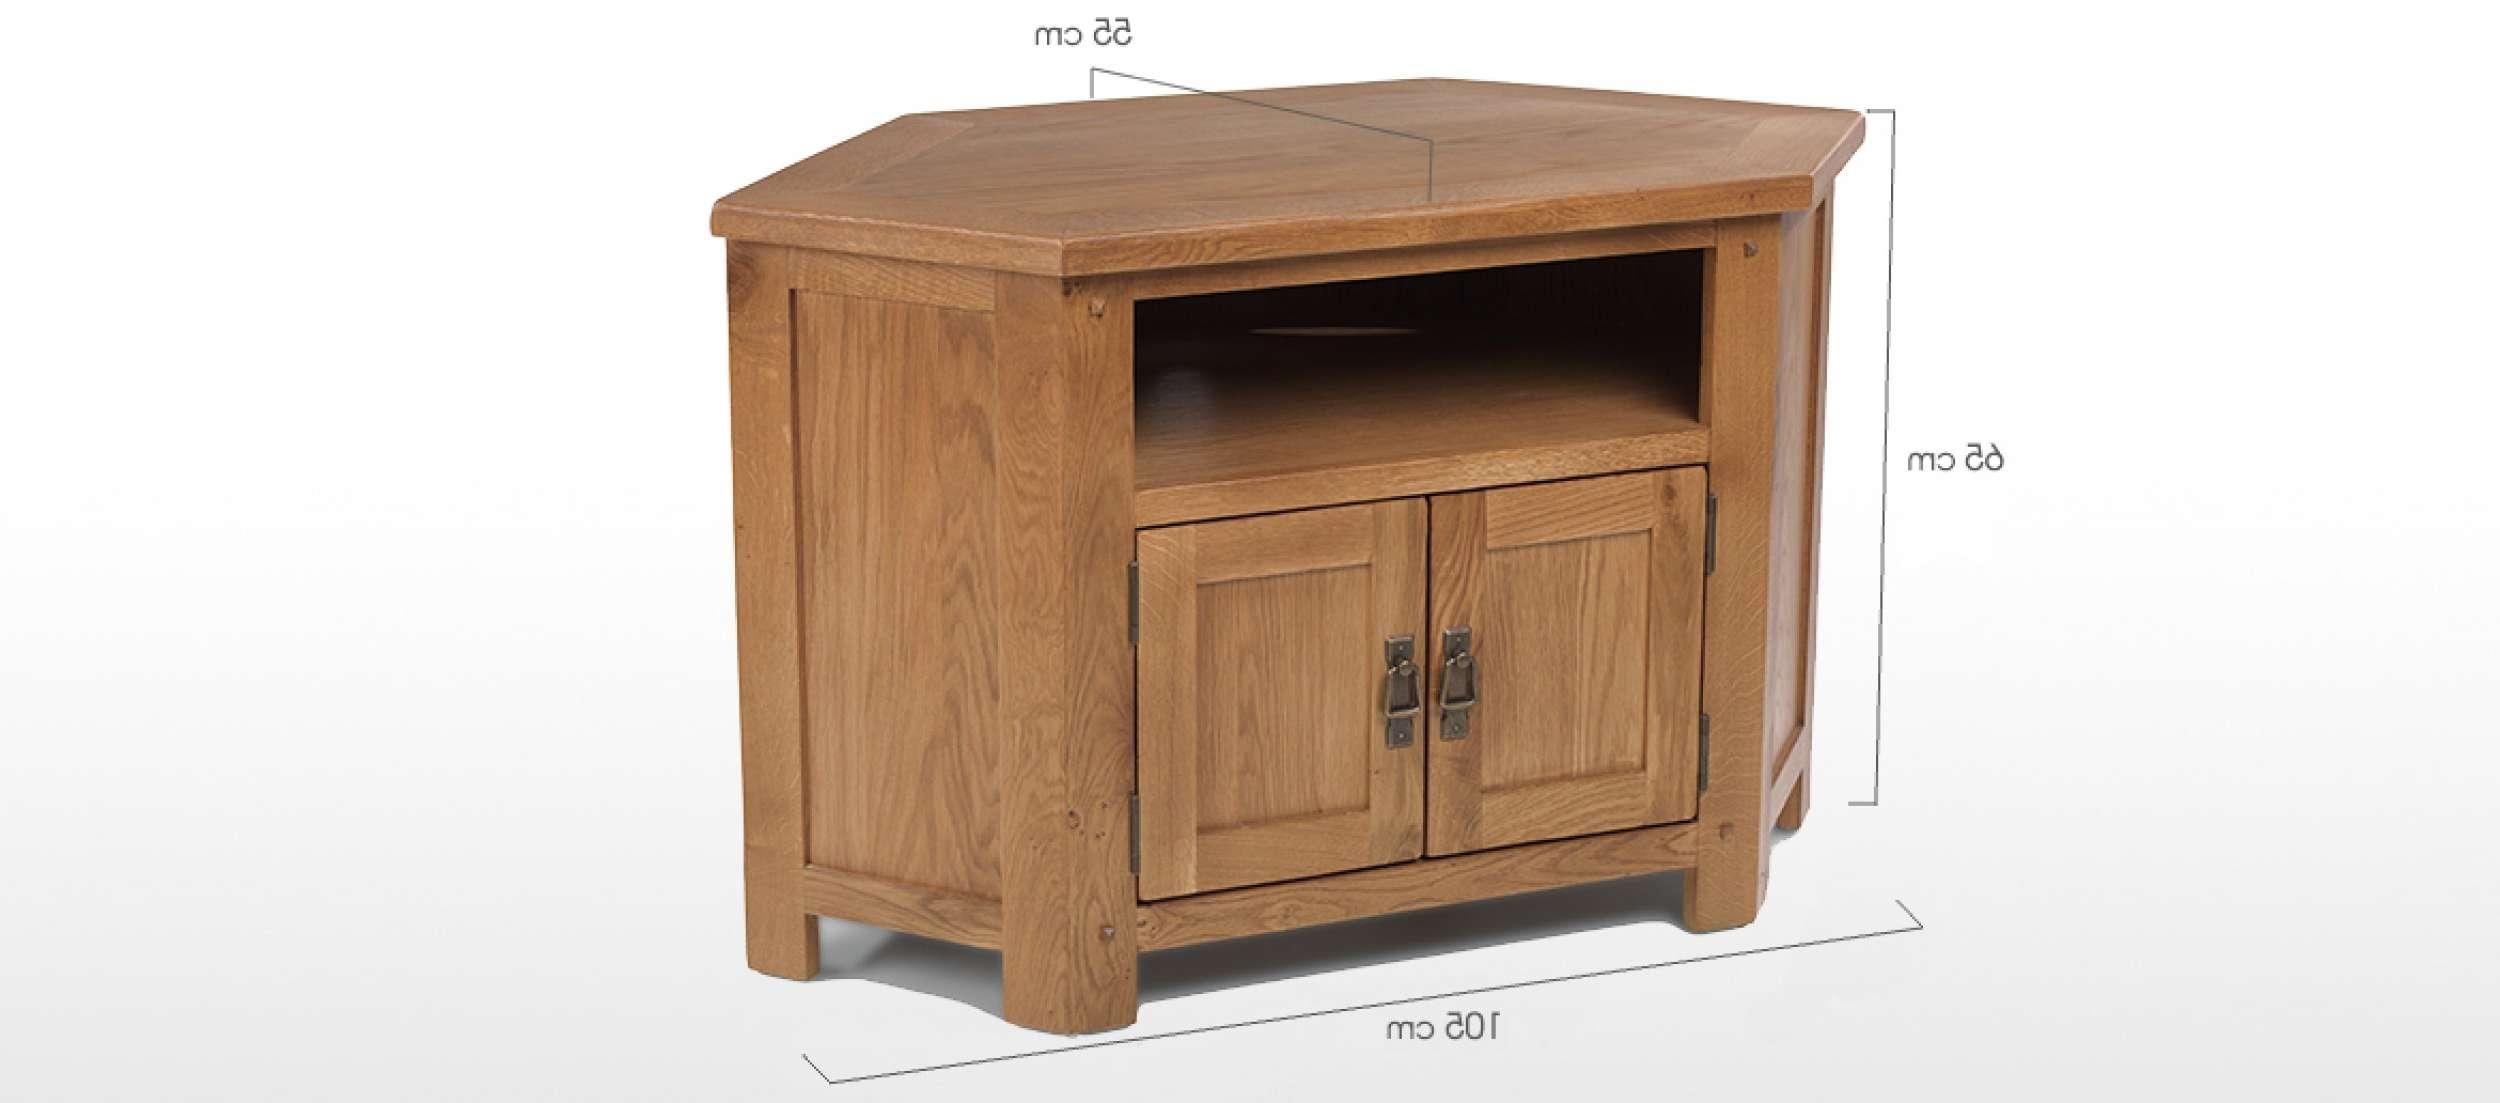 Rustic Oak Corner Tv Cabinet | Quercus Living Regarding Rustic Corner Tv Cabinets (View 2 of 20)